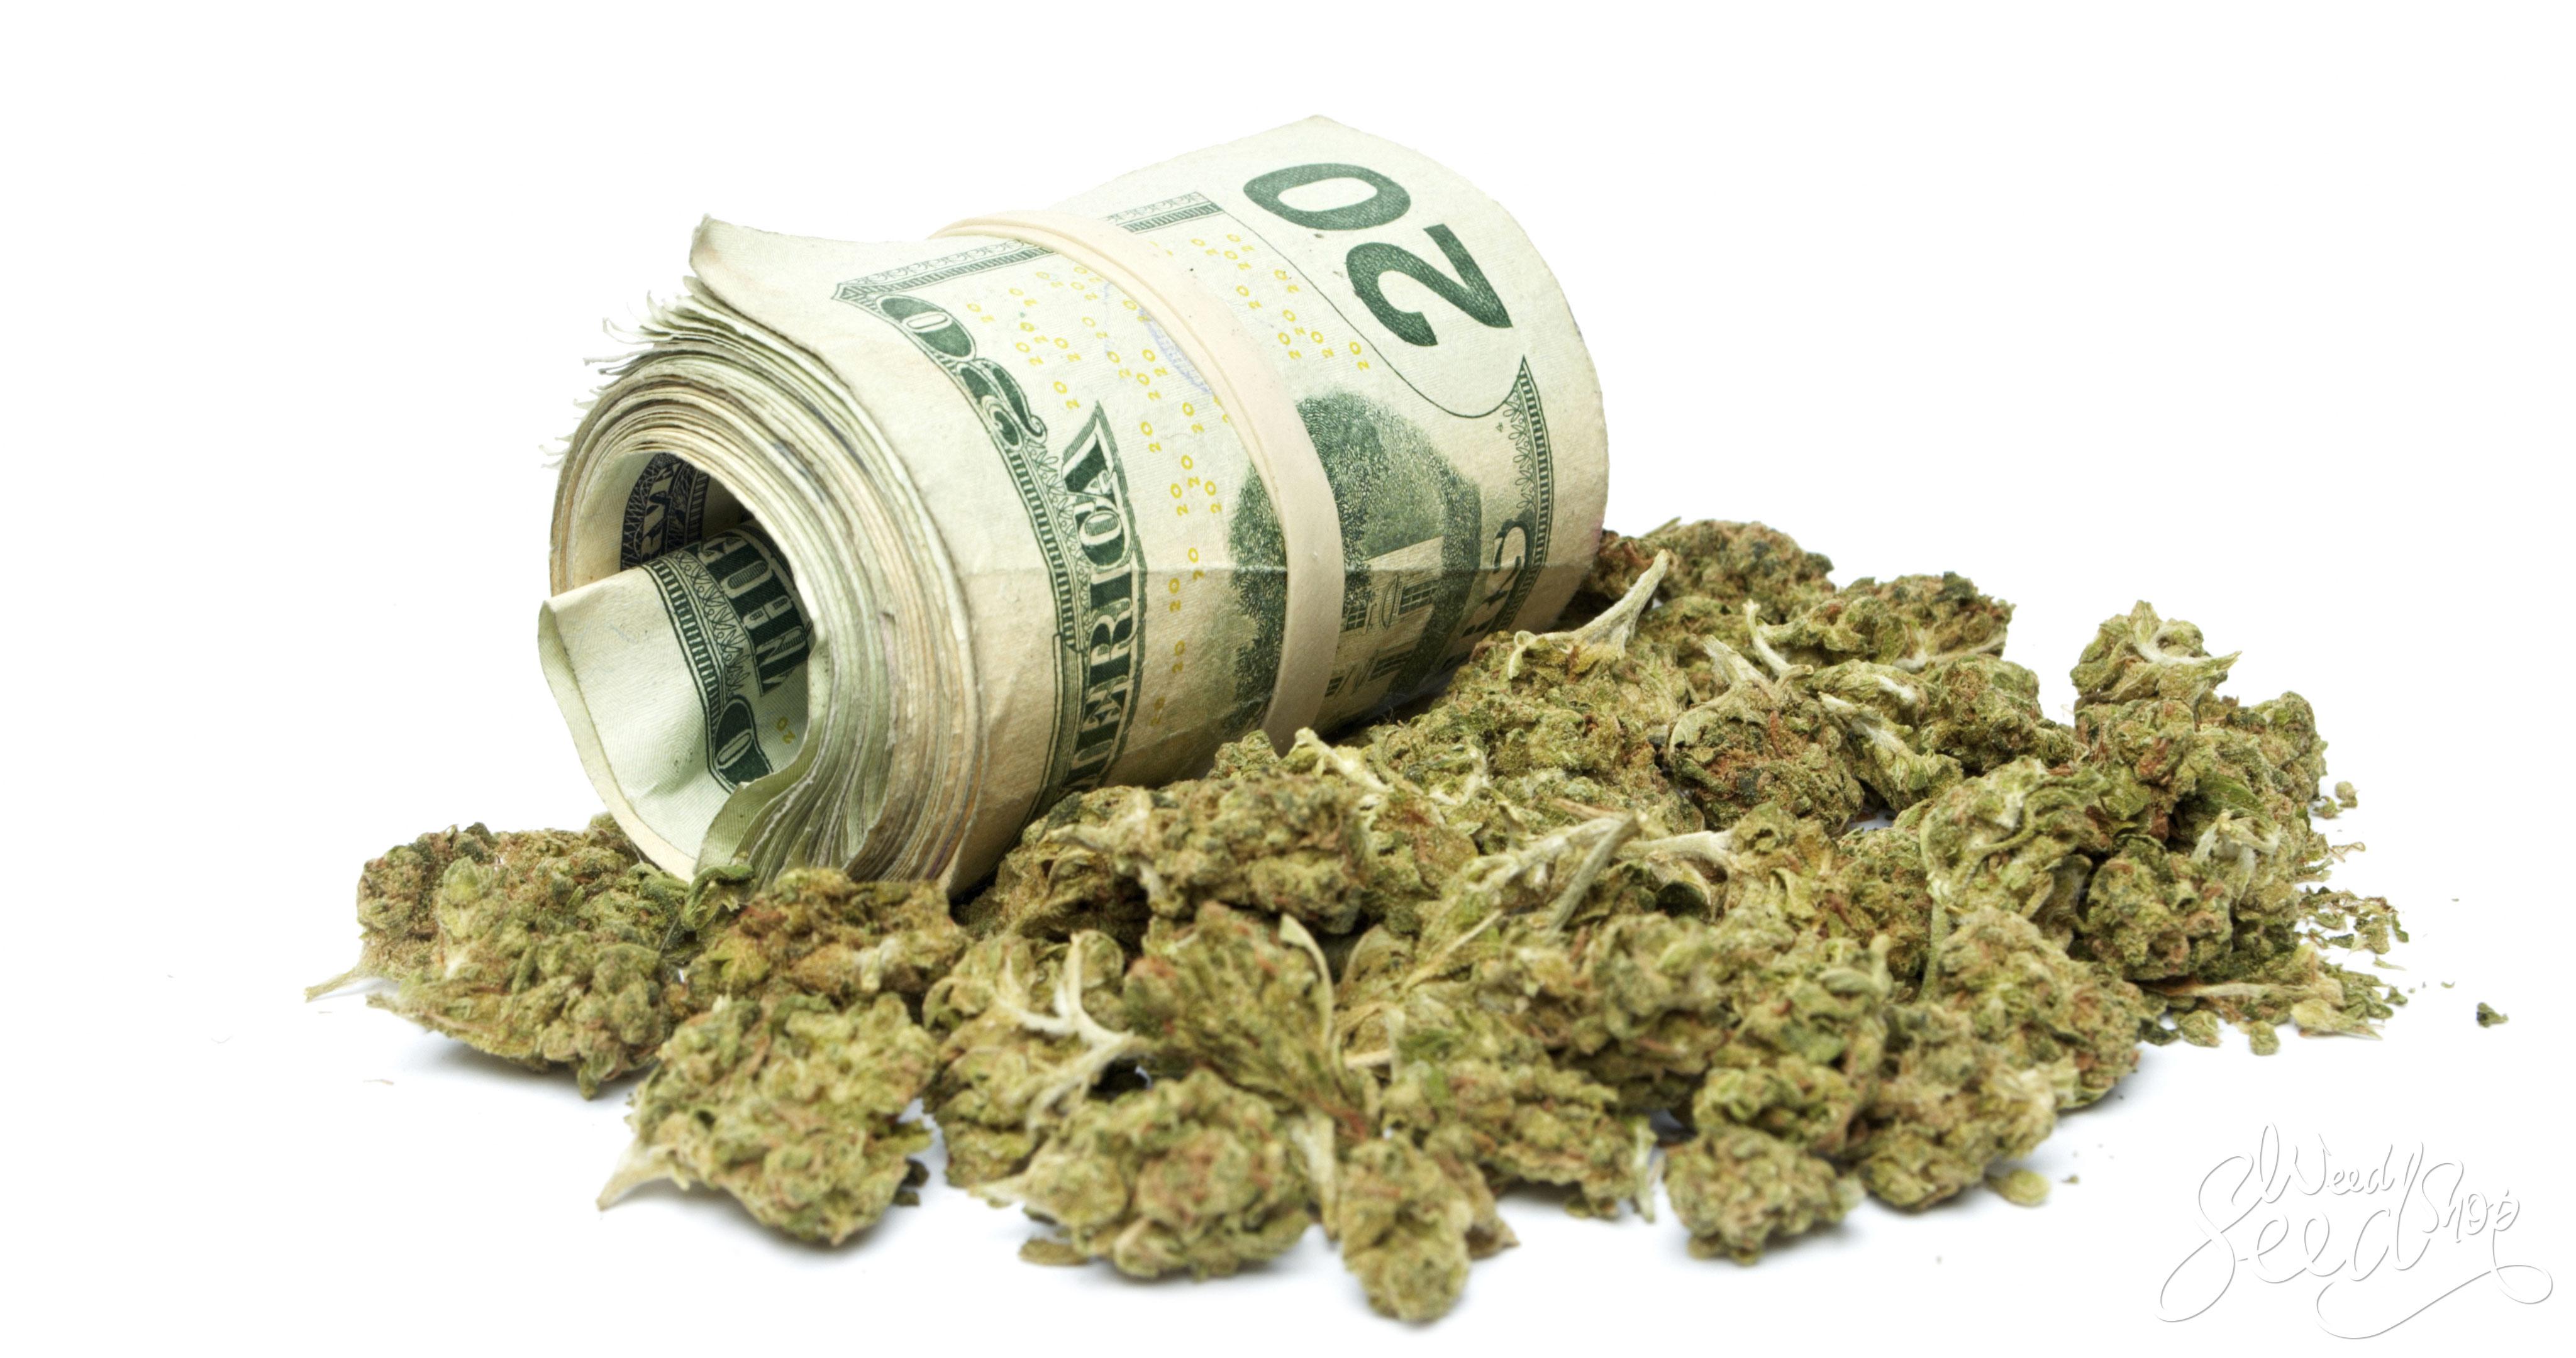 Comment économiser sur son budget de weed - WeedSeedShop